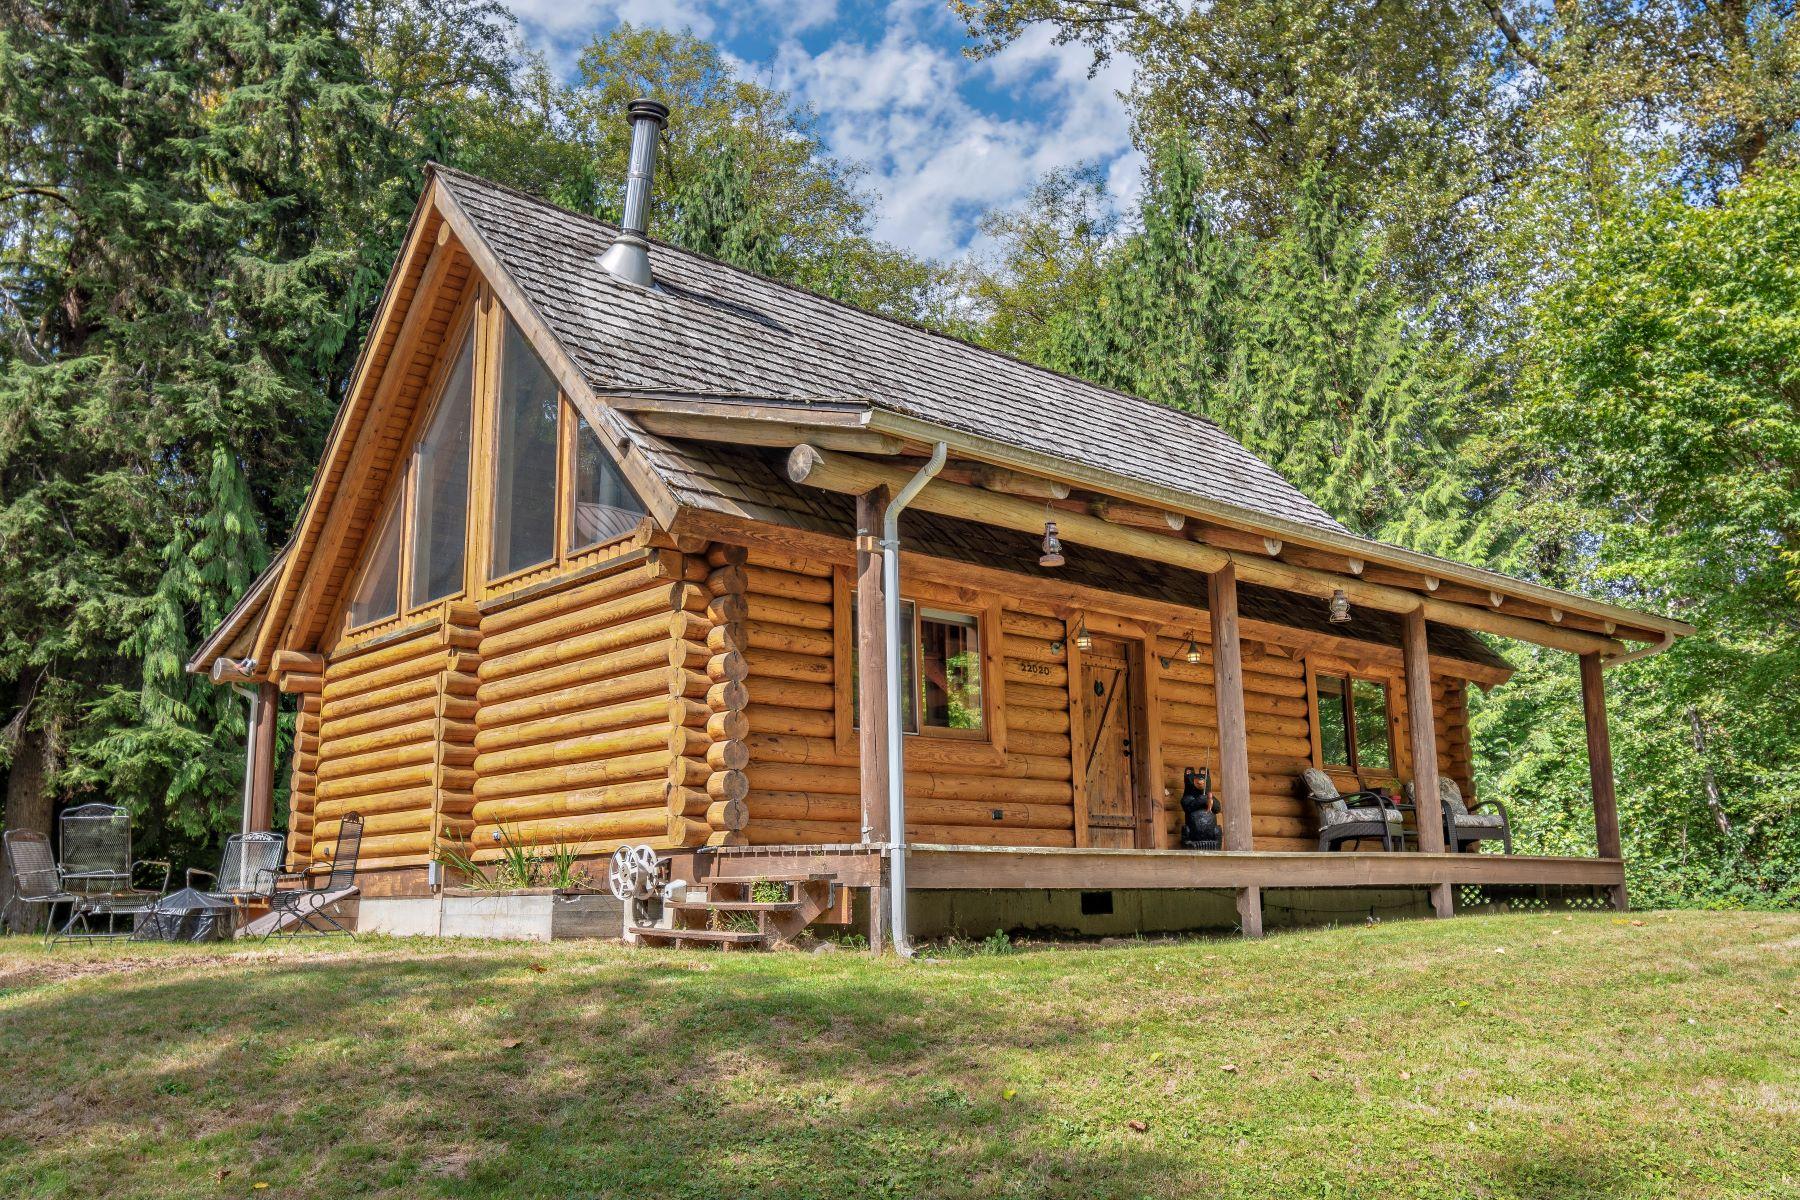 Single Family Homes for Sale at Craftsman Log Home 22020 149th Ave SE Monroe, Washington 98272 United States